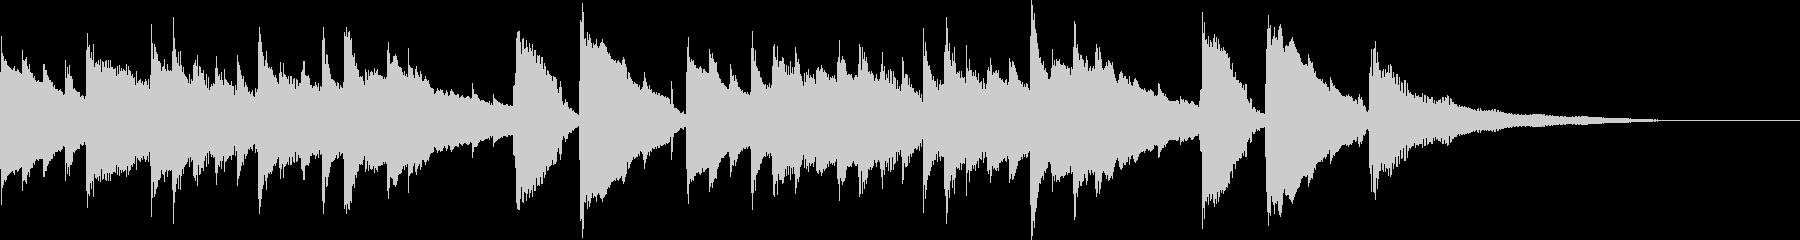 CM30秒、感動的なアコギとグロッケンの未再生の波形